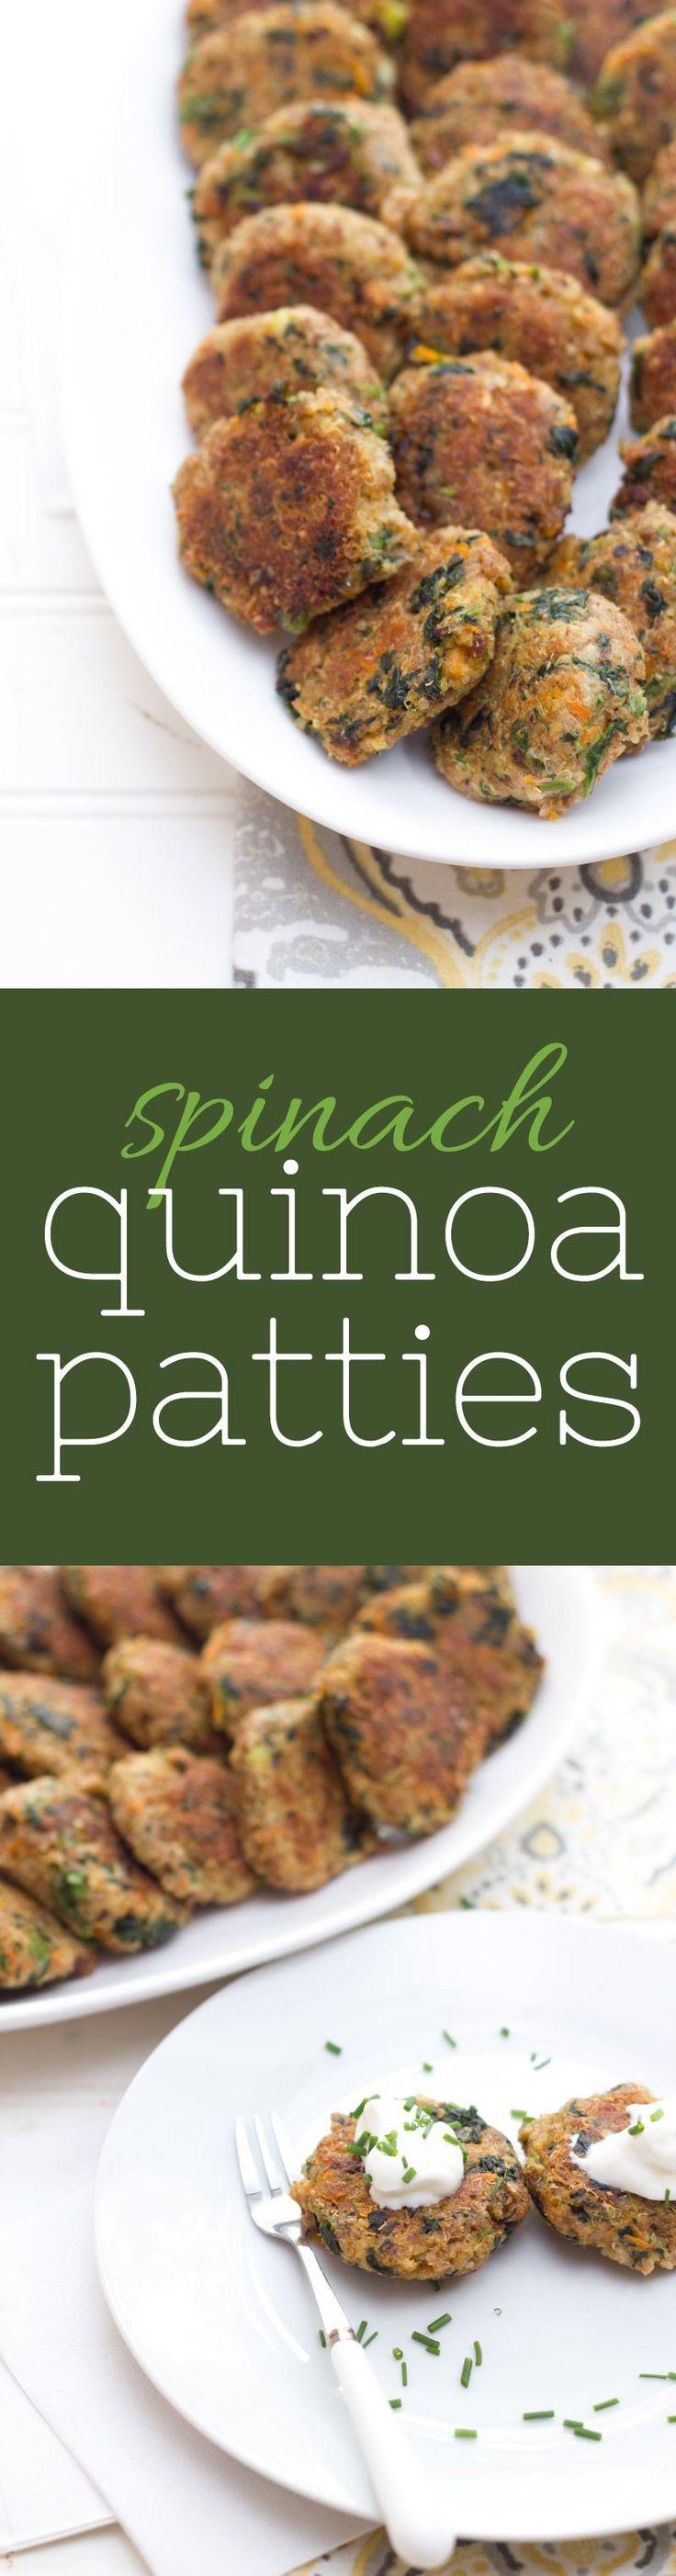 Spinach-Quinoa Patties Recipe